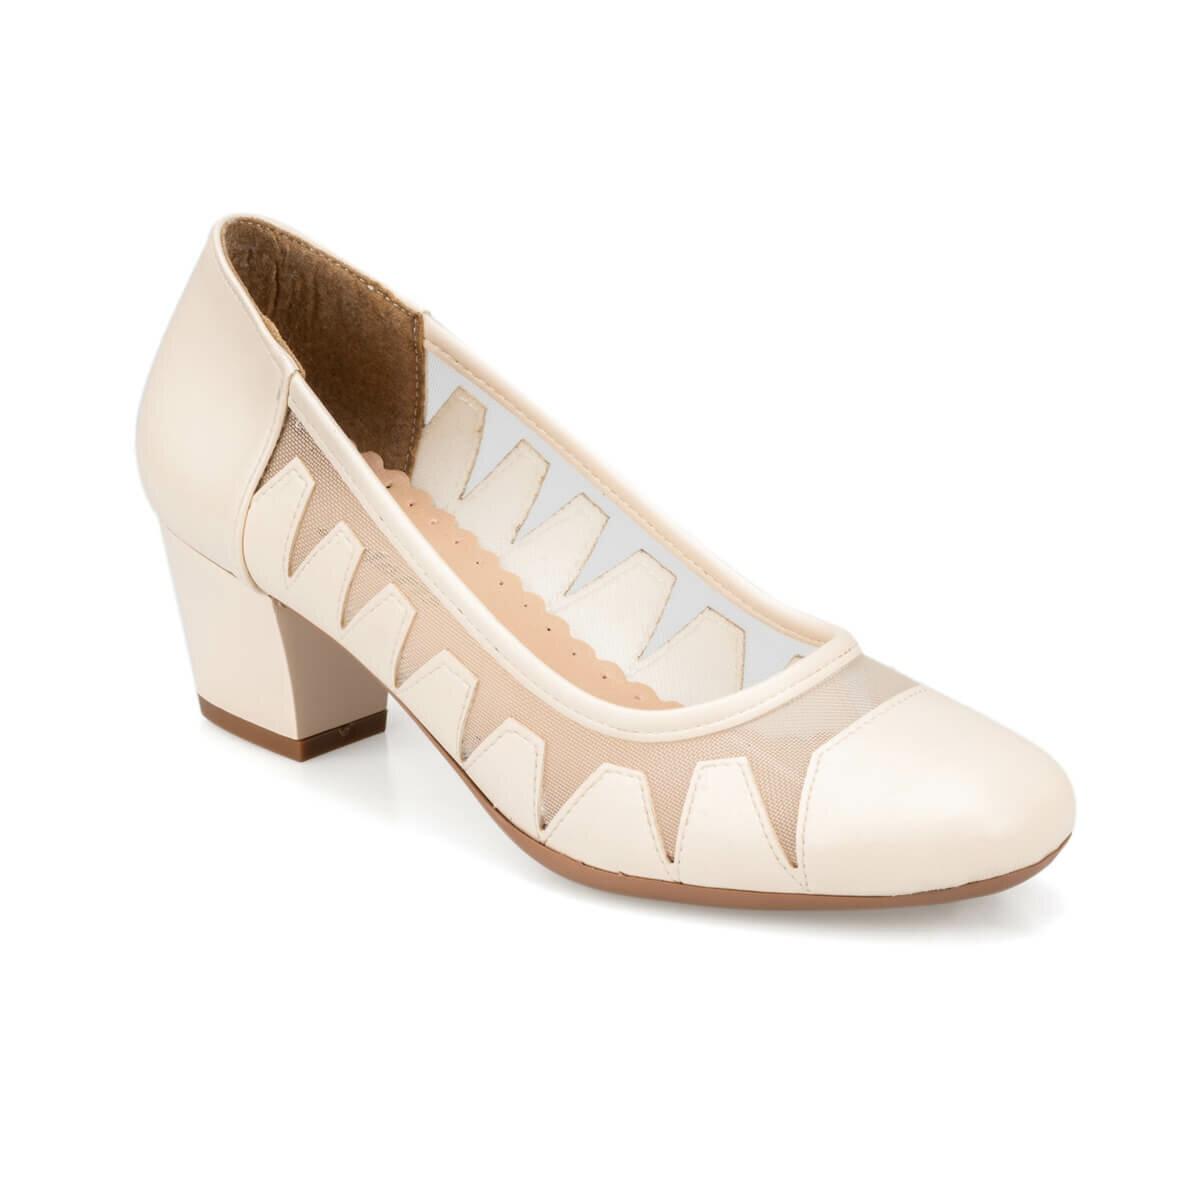 FLO 91. 311171.Z Beige Women Gova Shoes Polaris